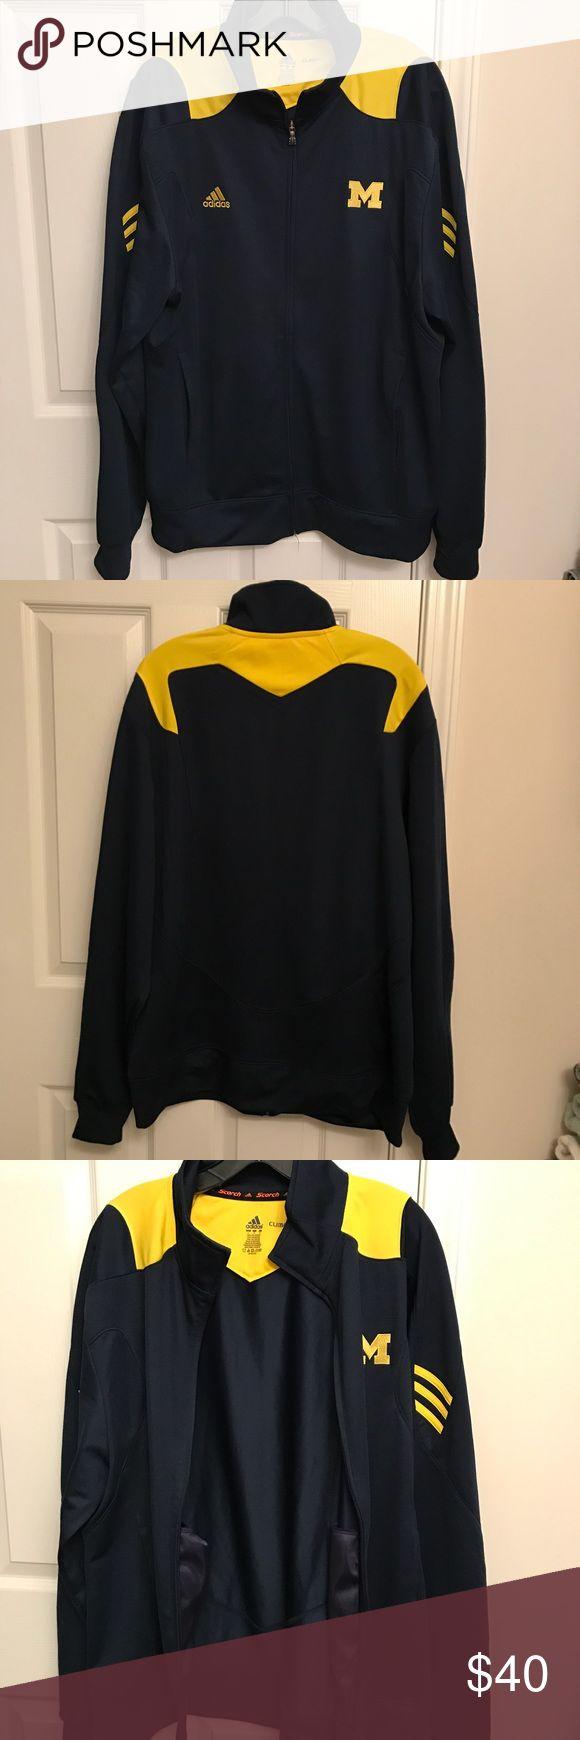 Adidas MICHIGAN Climalite Men's Lightweight Jacket NWOT Adidas MICHIGAN Climalite Men's Lightweight Jacket. From no pets & non smoker home. Adidas Jackets & Coats Lightweight & Shirt Jackets